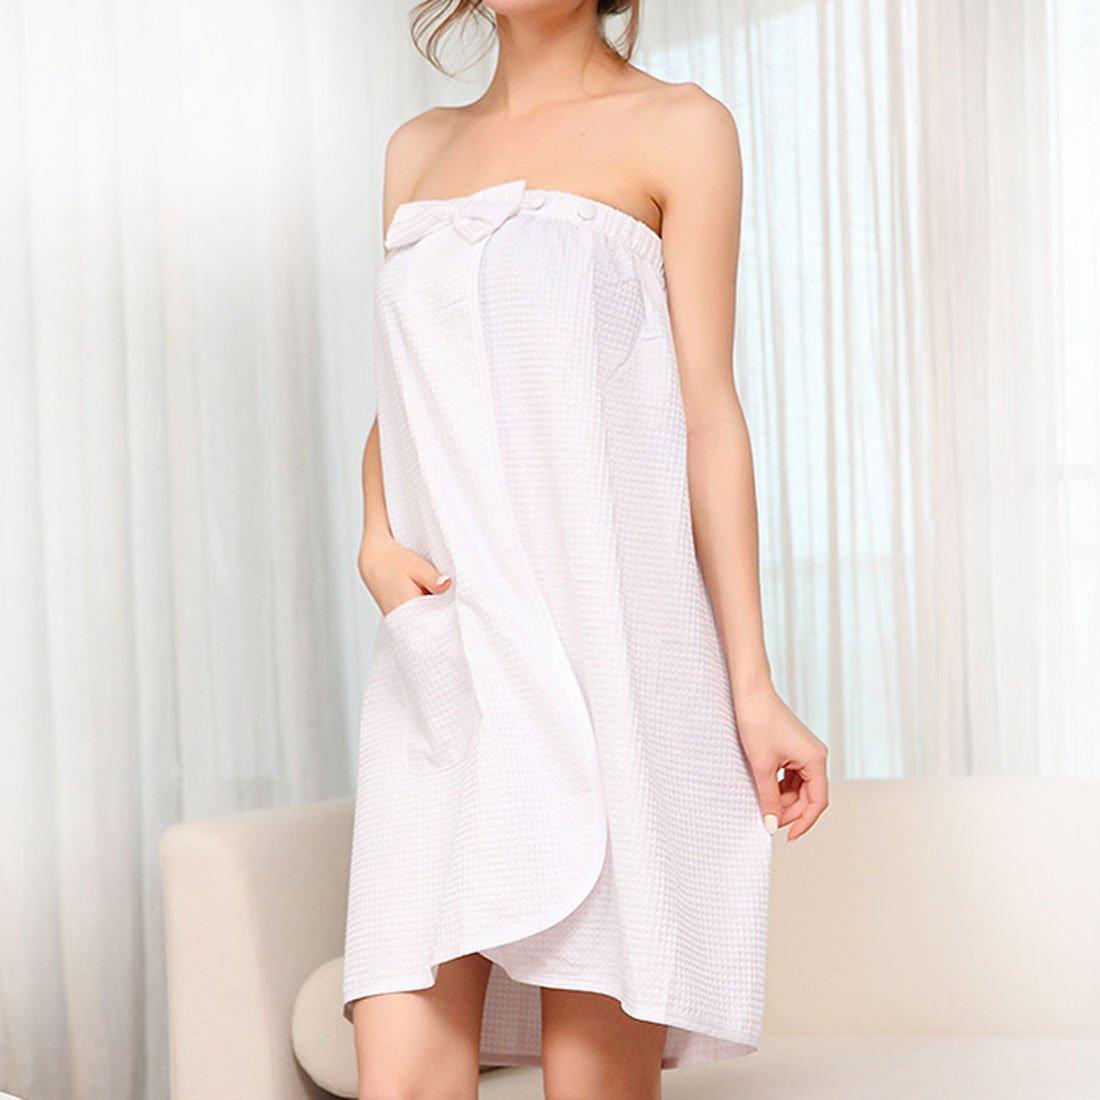 DealMux Cotton Lady Bowknot Adjustable Waffle Spa Bath Body Wrap 74cm Length White by DealMux (Image #3)